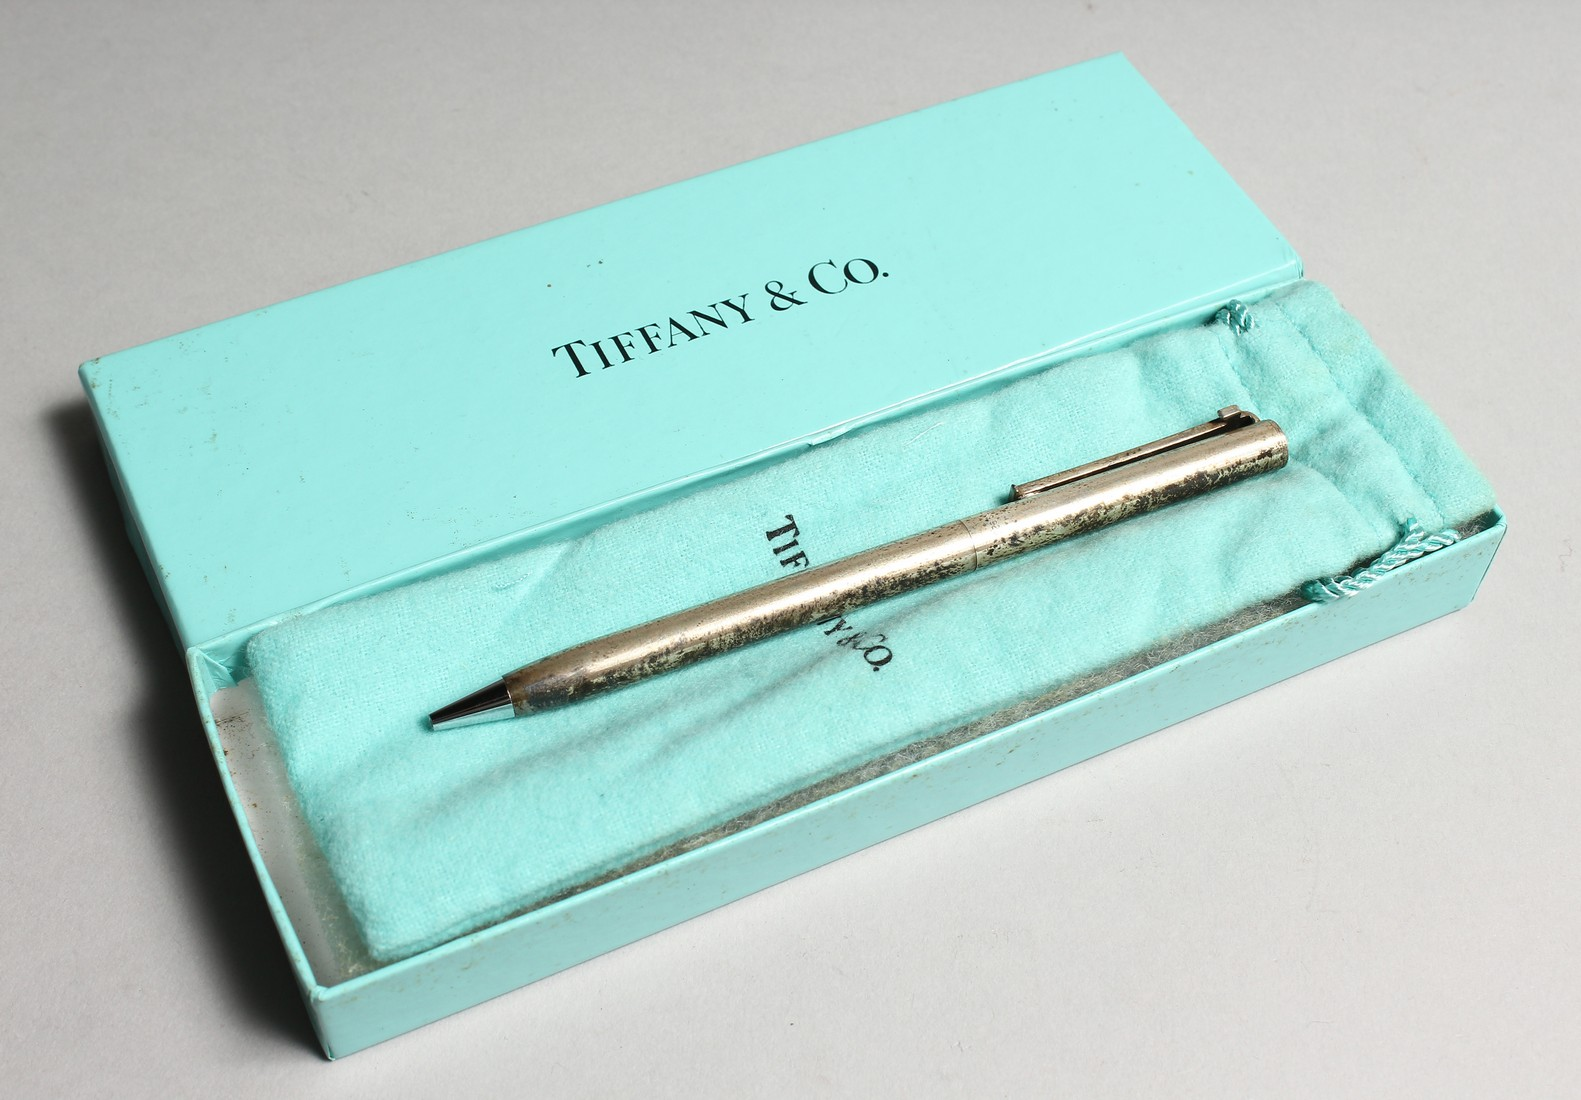 A TIFFANY SILVER PEN in a Tiffany box.